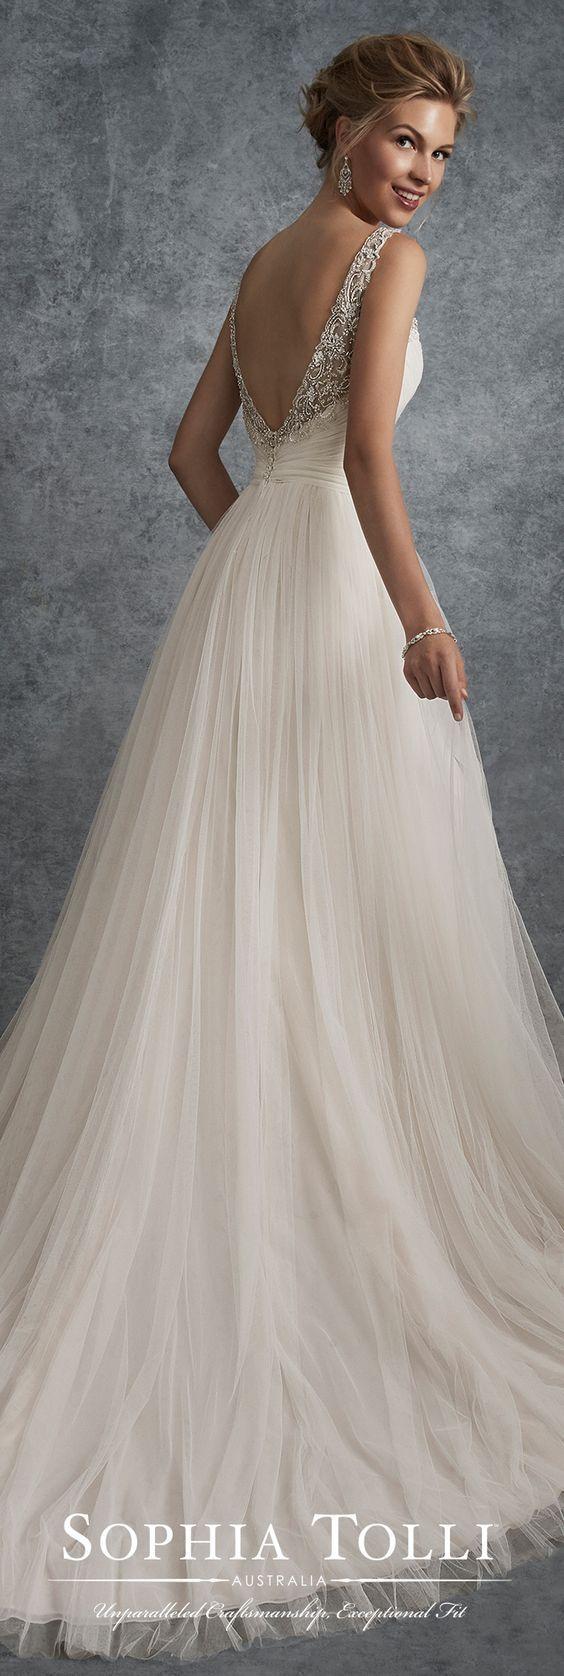 Featured dress sophia tolli wedding dress idea haute couture